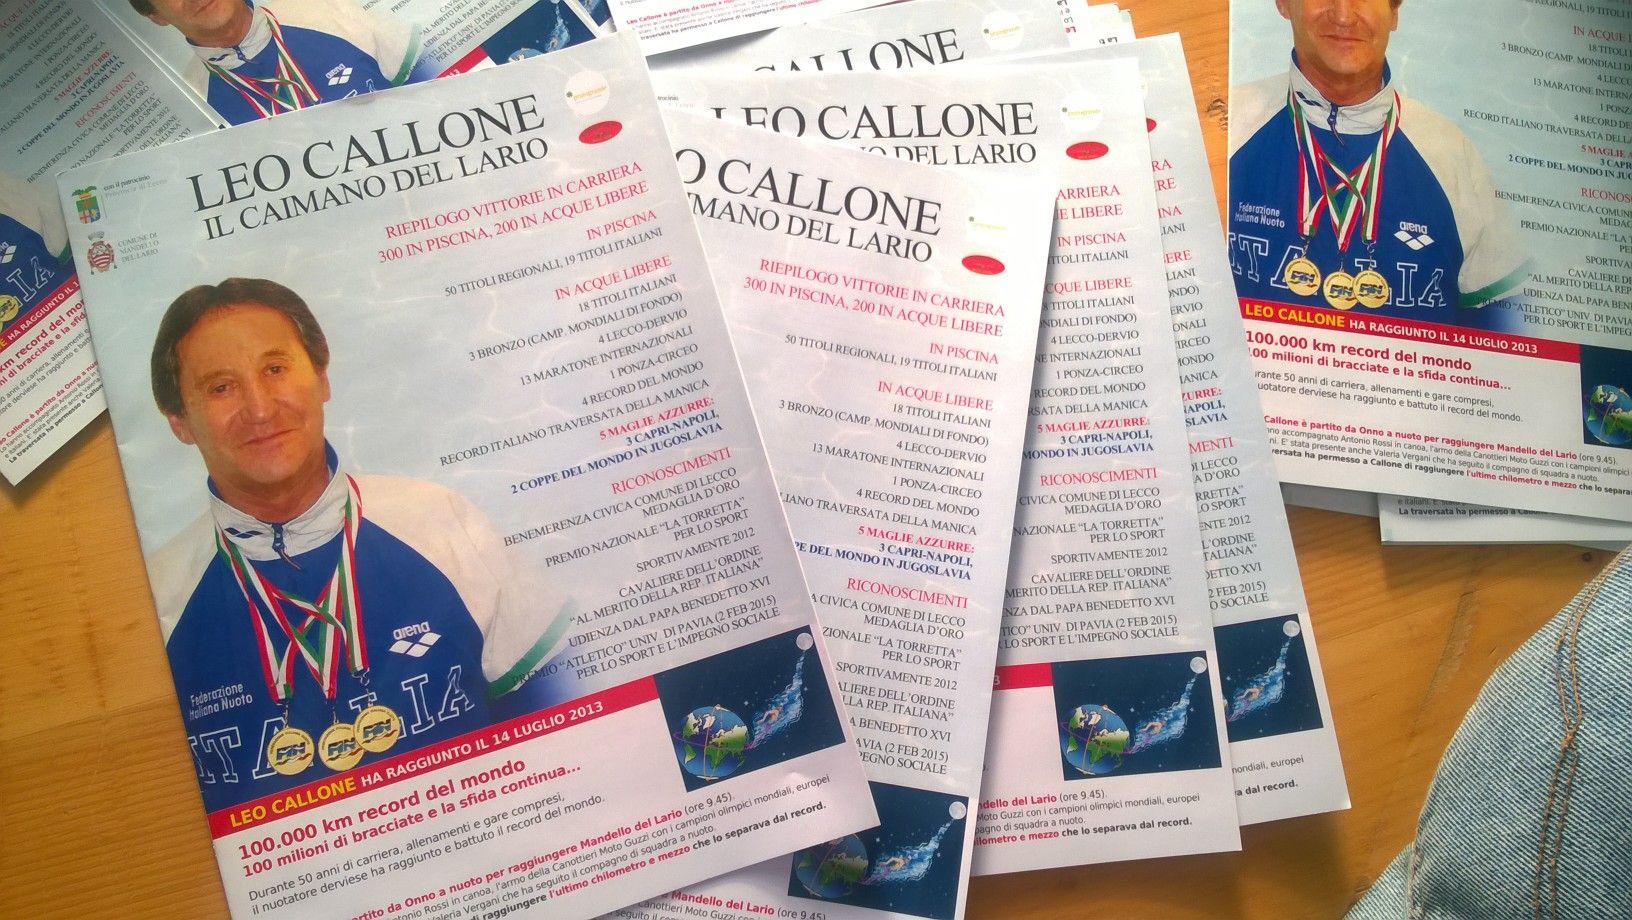 callone3.jpg